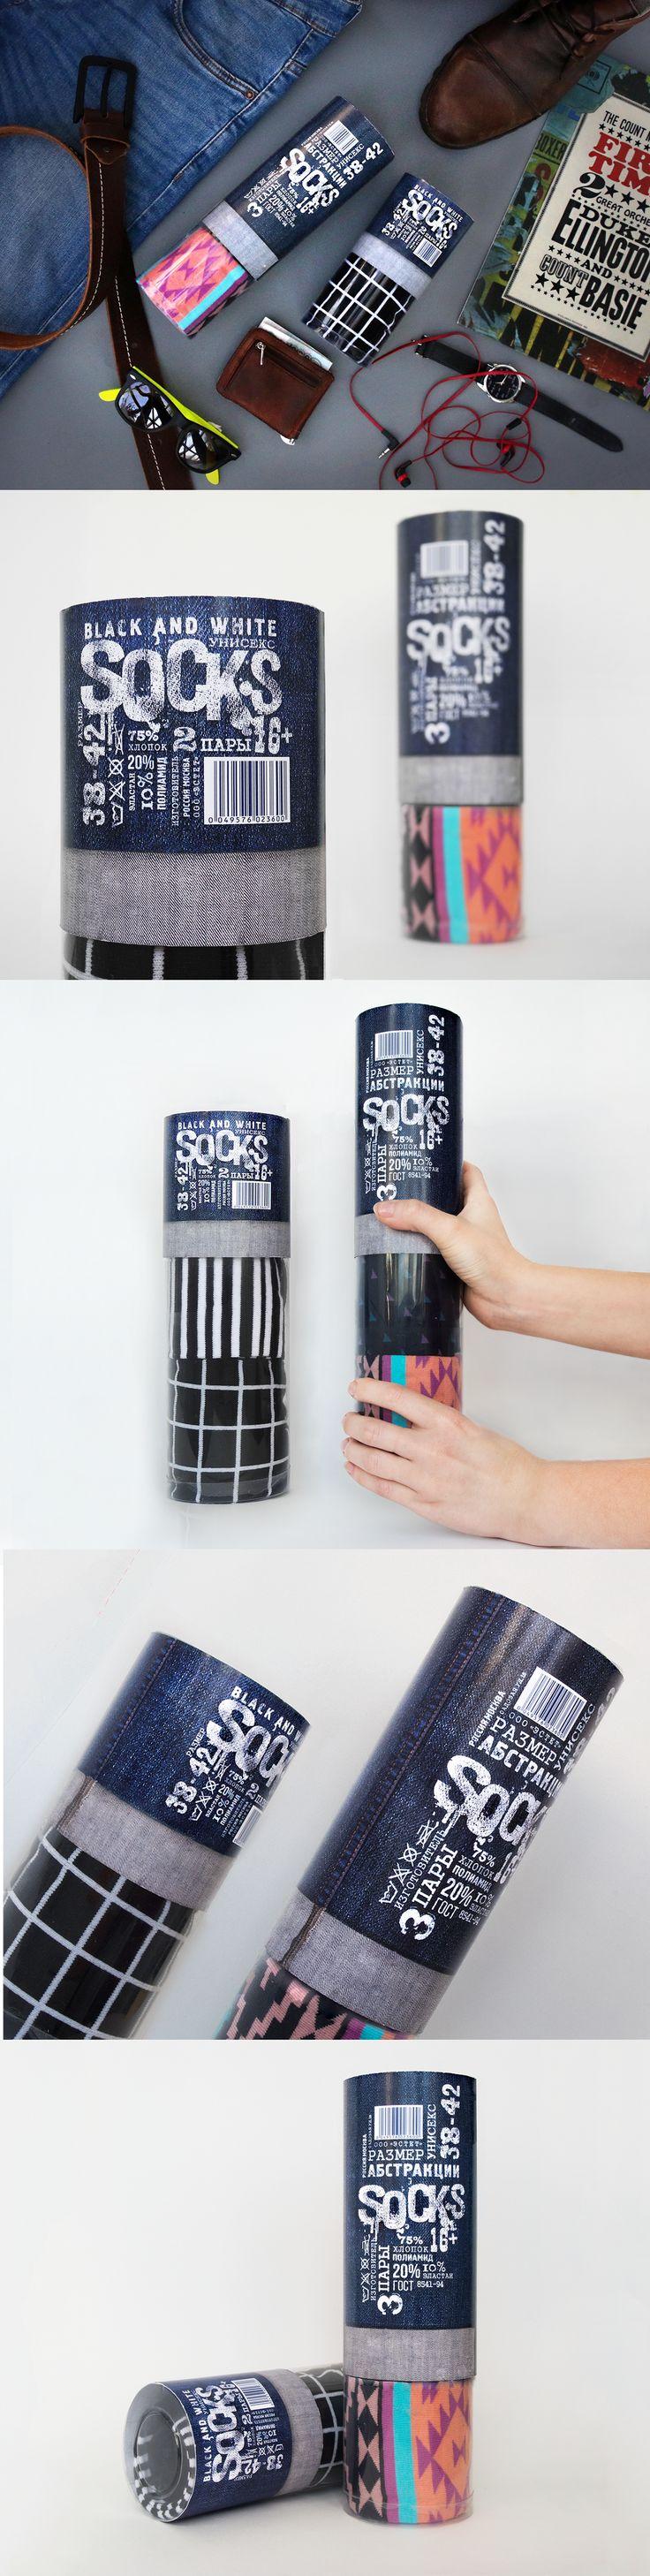 packaging hipster socks on Behance by Maria Zelenskaya Москва, Russian Federation PD